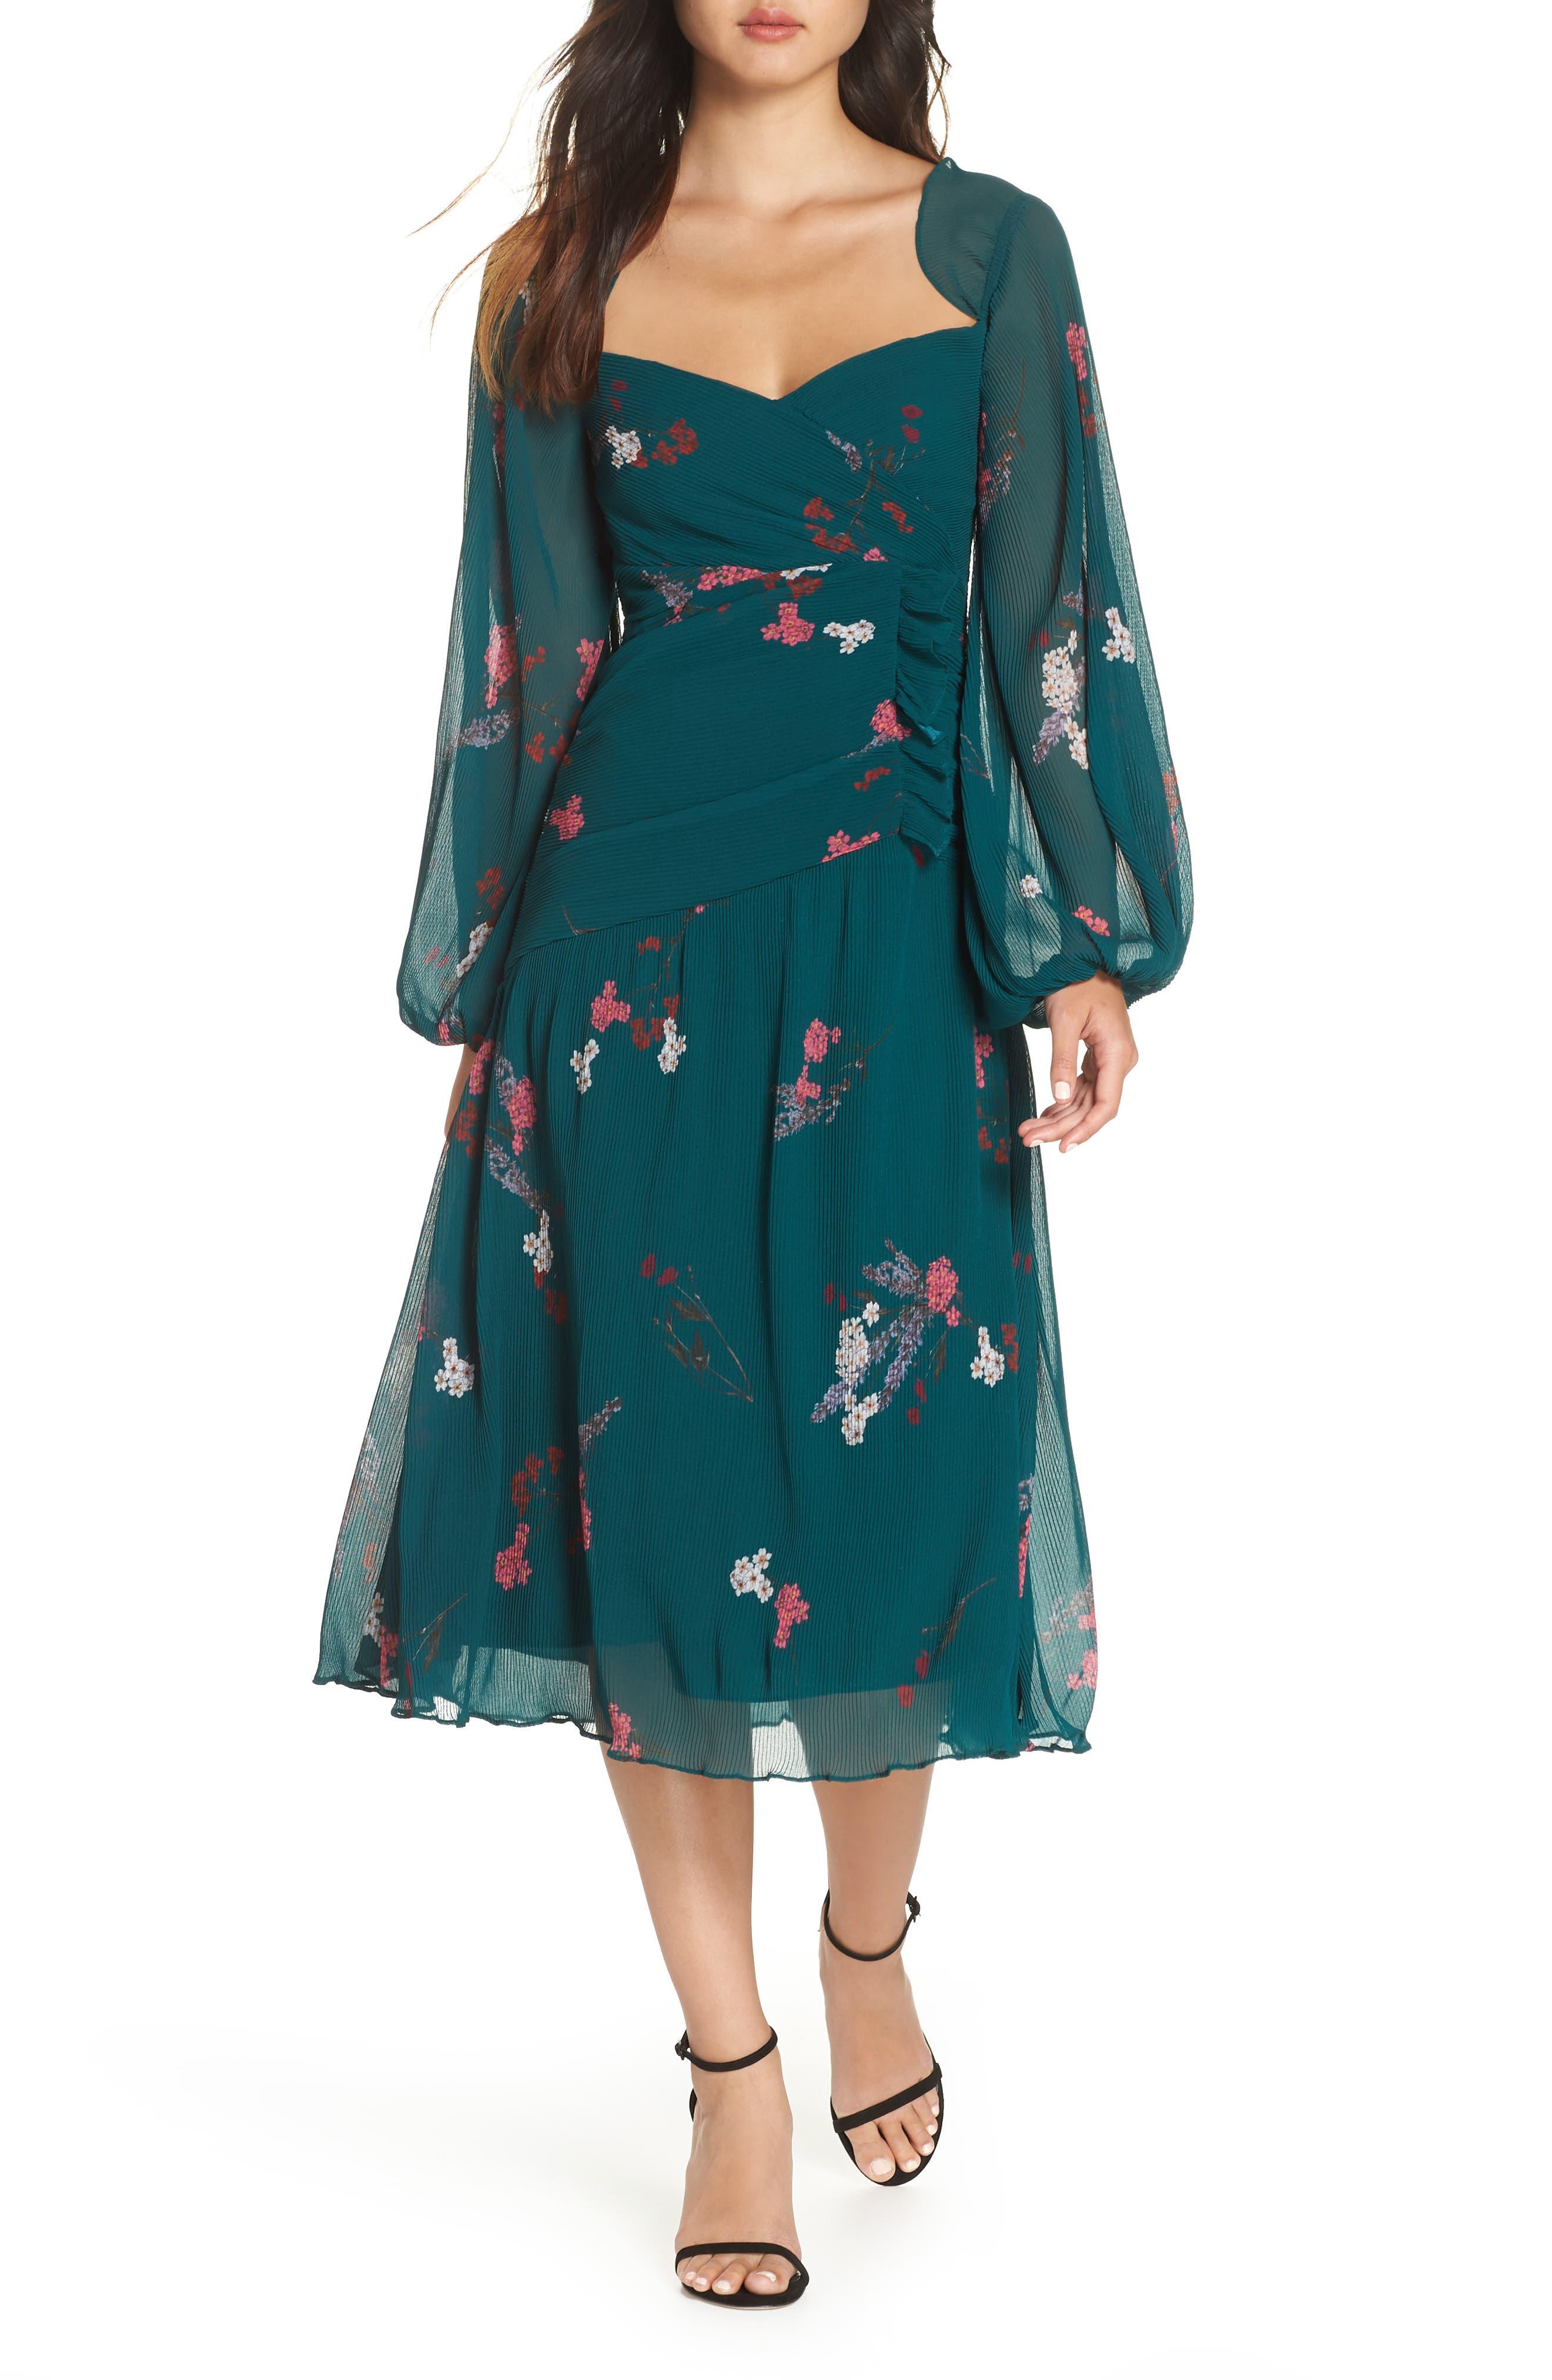 Night Fall Midi Dress,                             Main thumbnail 1, color,                             310